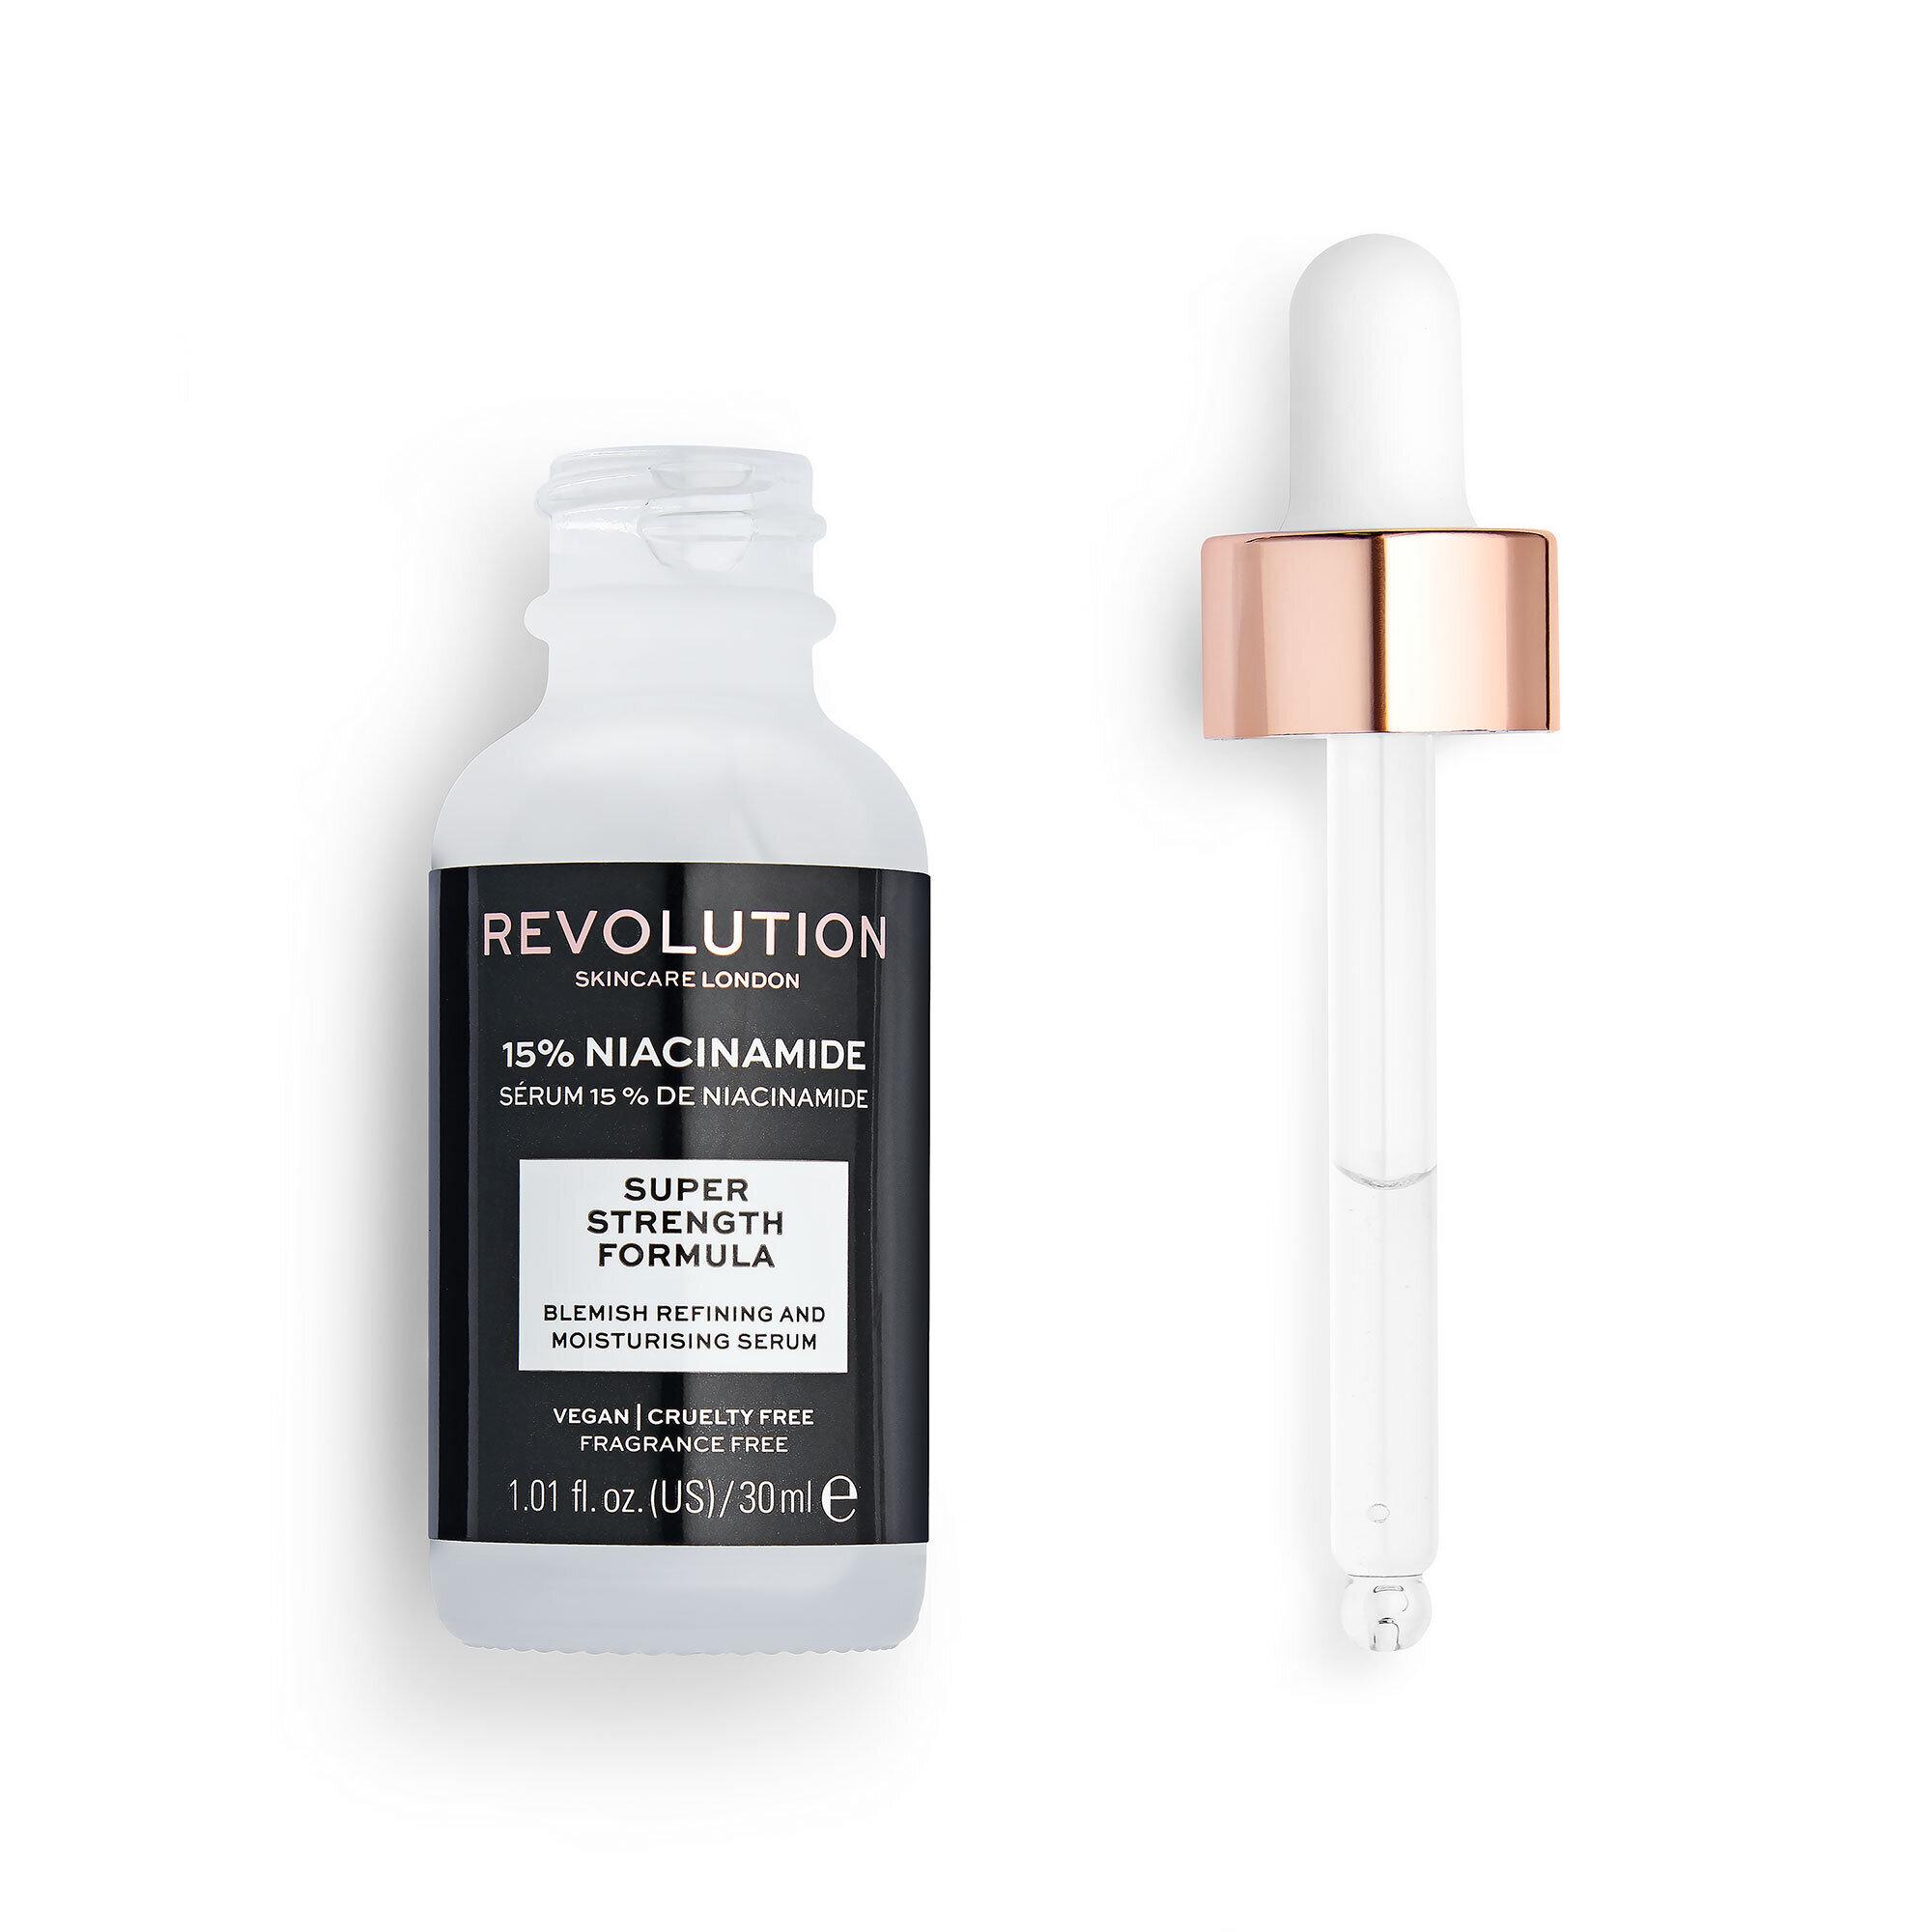 Revolution Skincare 15% Niacinamide Blemish & Pore Serum